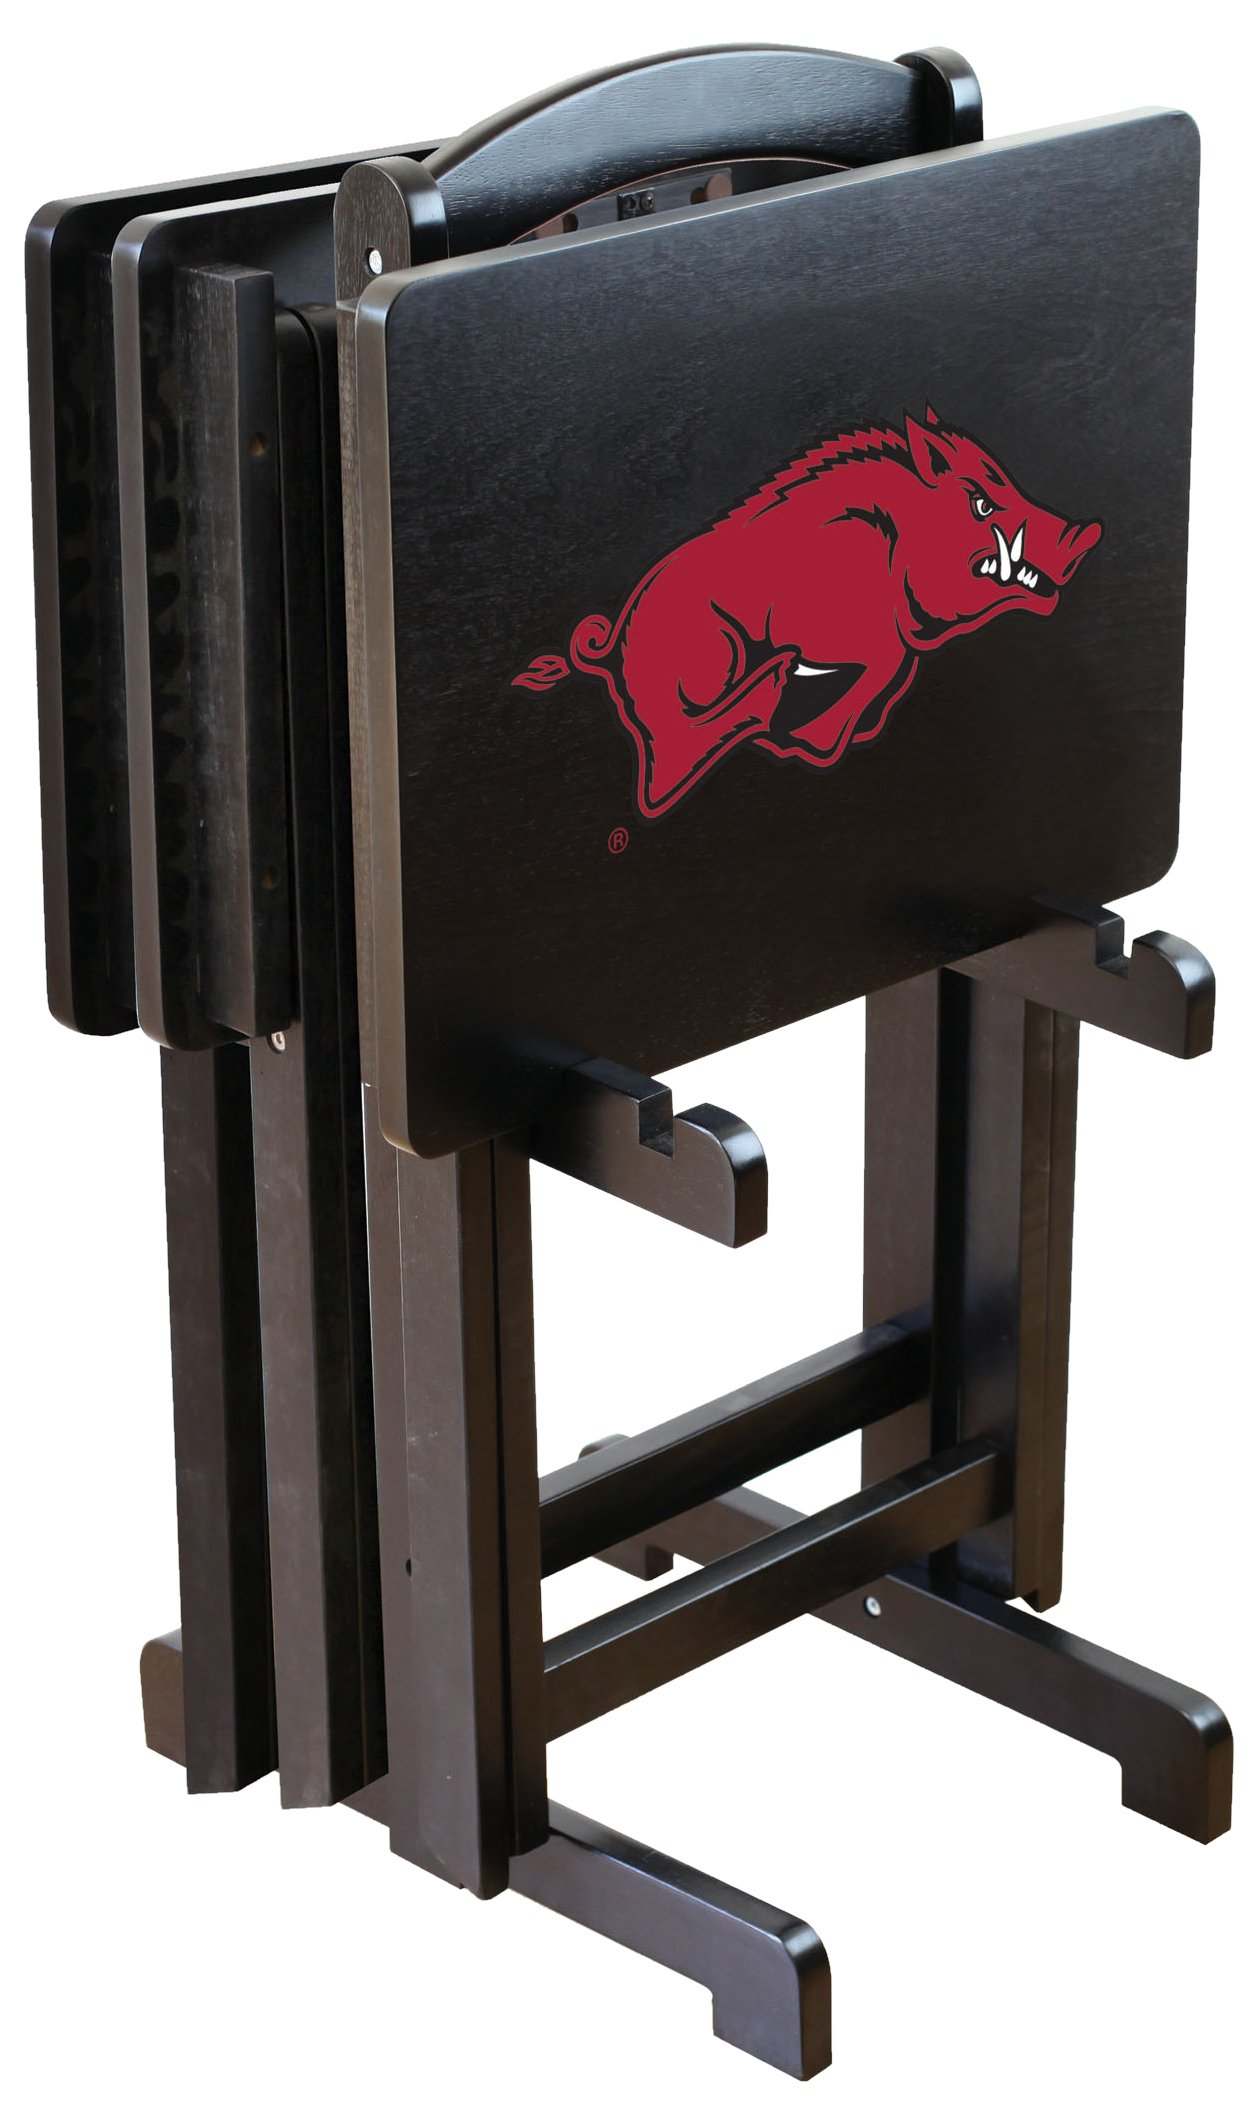 NCAA Arkansas Razorbacks University Tv Trays With Stand, One Size, Multicolor